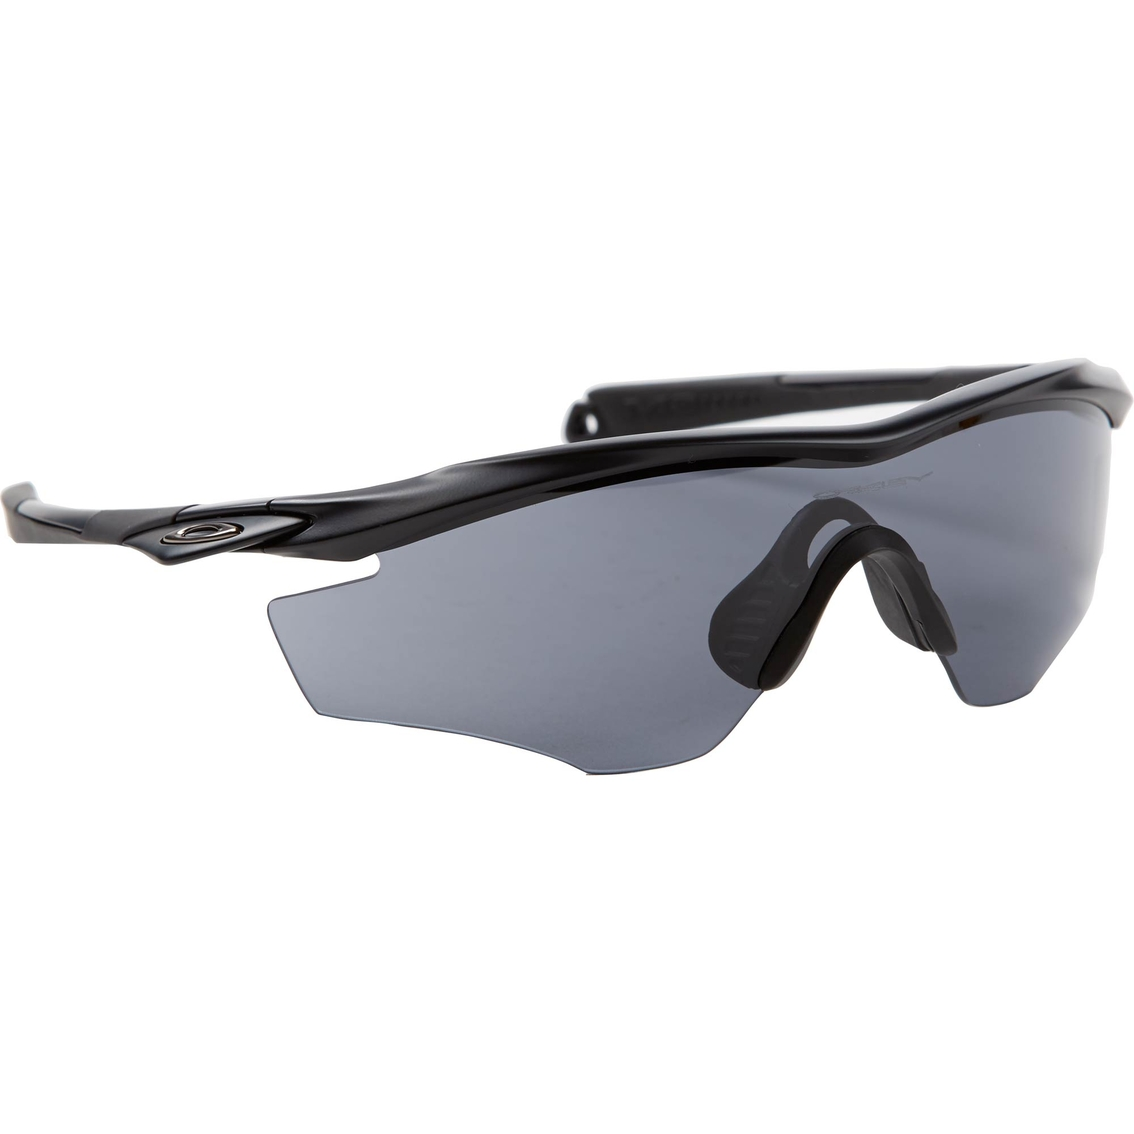 womens oakley military sunglasses  oakley si m2 frame matte black/gray lens